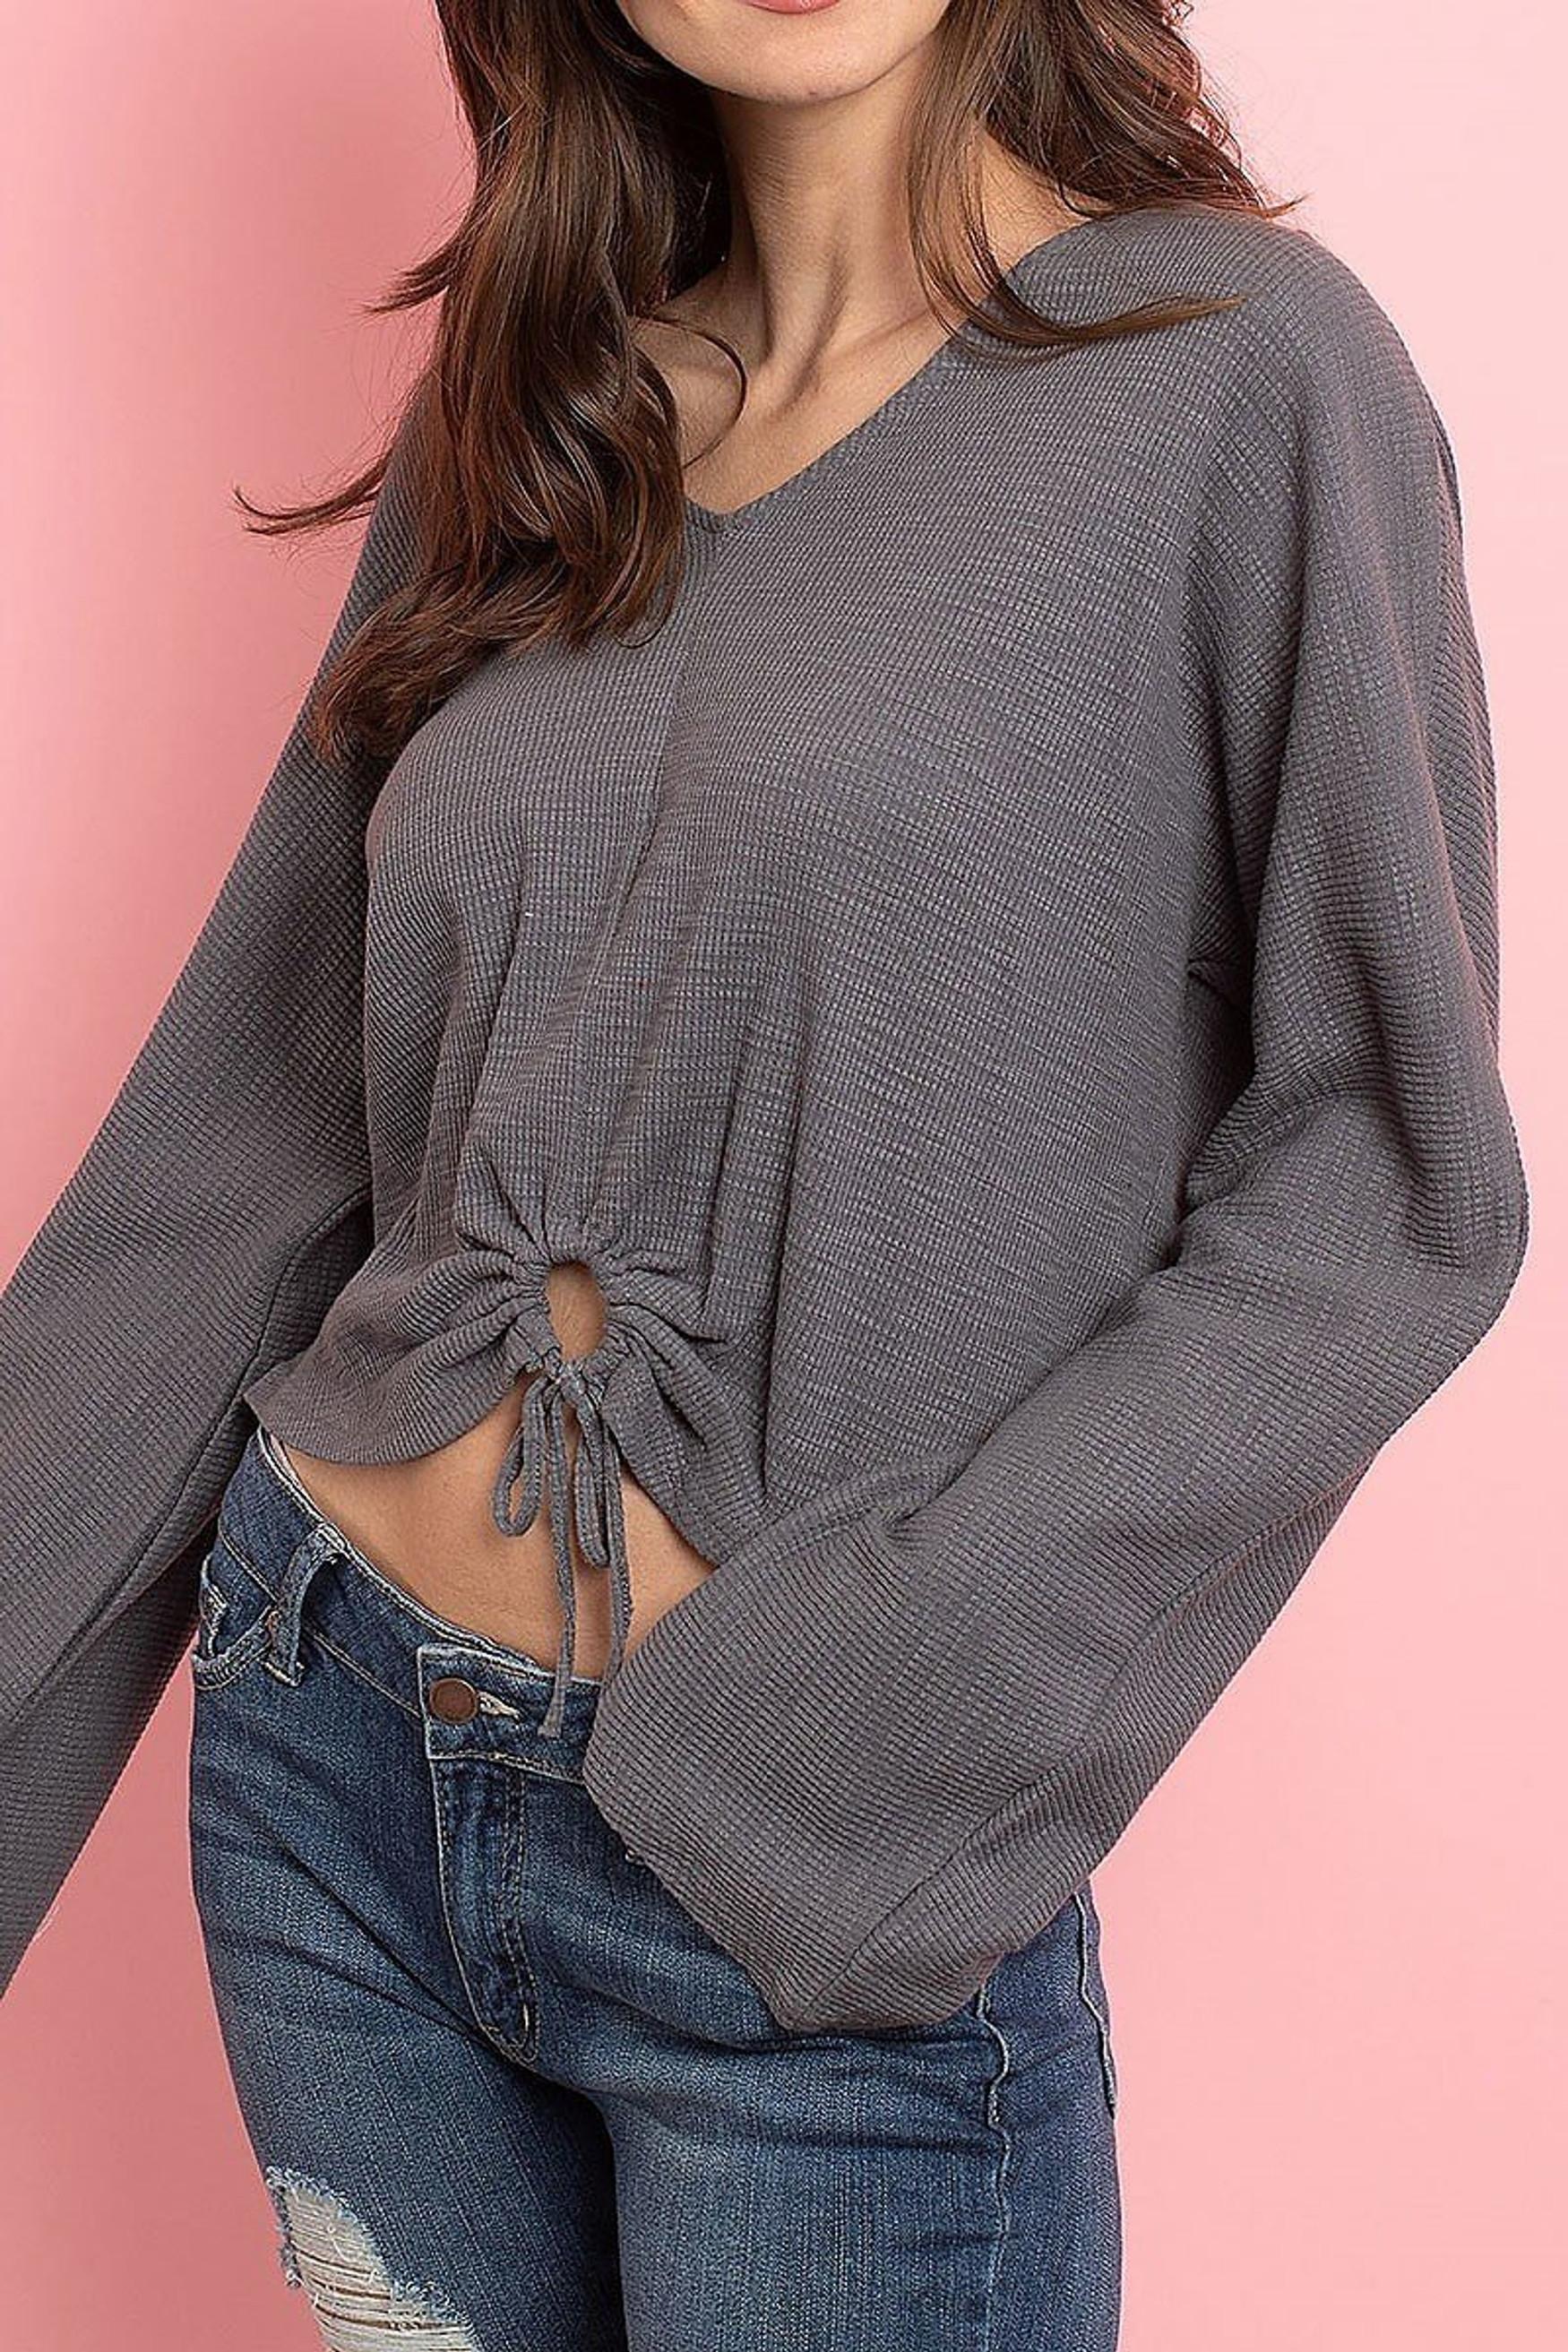 Charcoal Cropped Waist Tie Hem Long Sleeve Cotton V-Neck Top